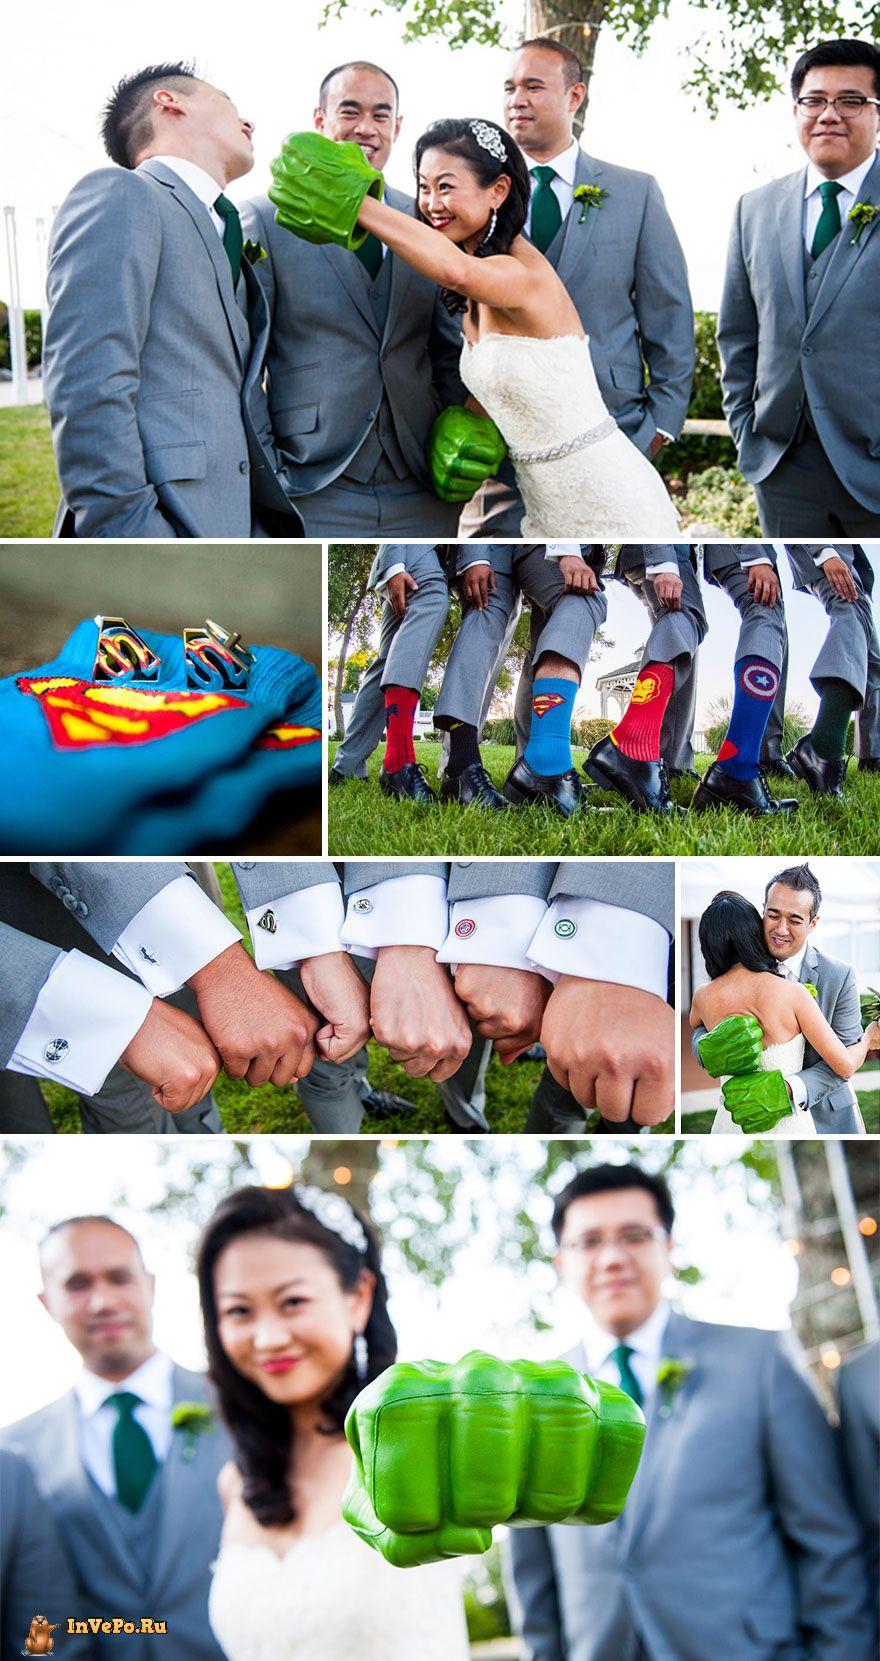 Свадьба супергероев Marvel